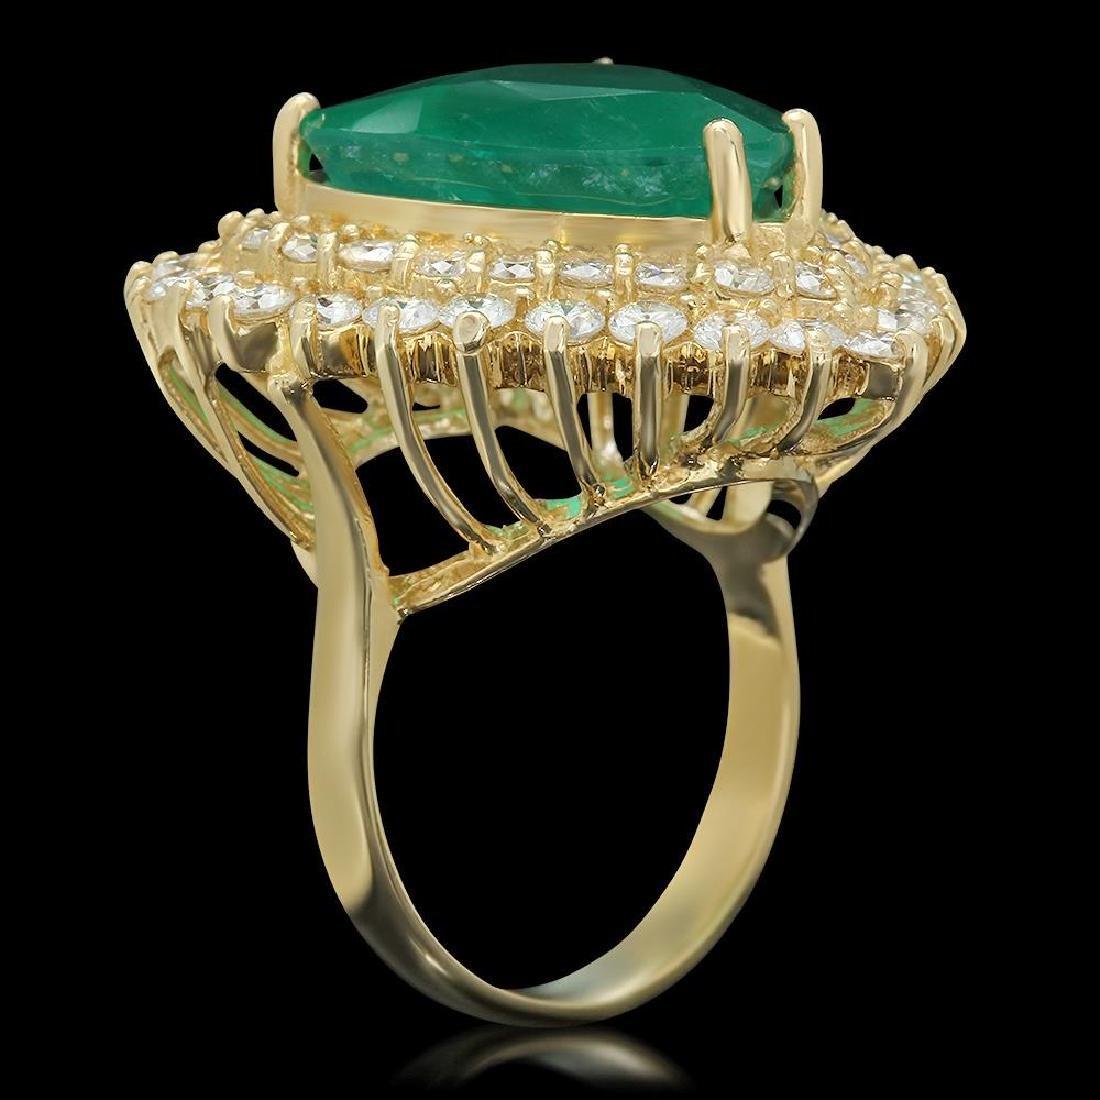 14K Gold 11.09ct Emerald 2.83ct Diamond Ring - 2